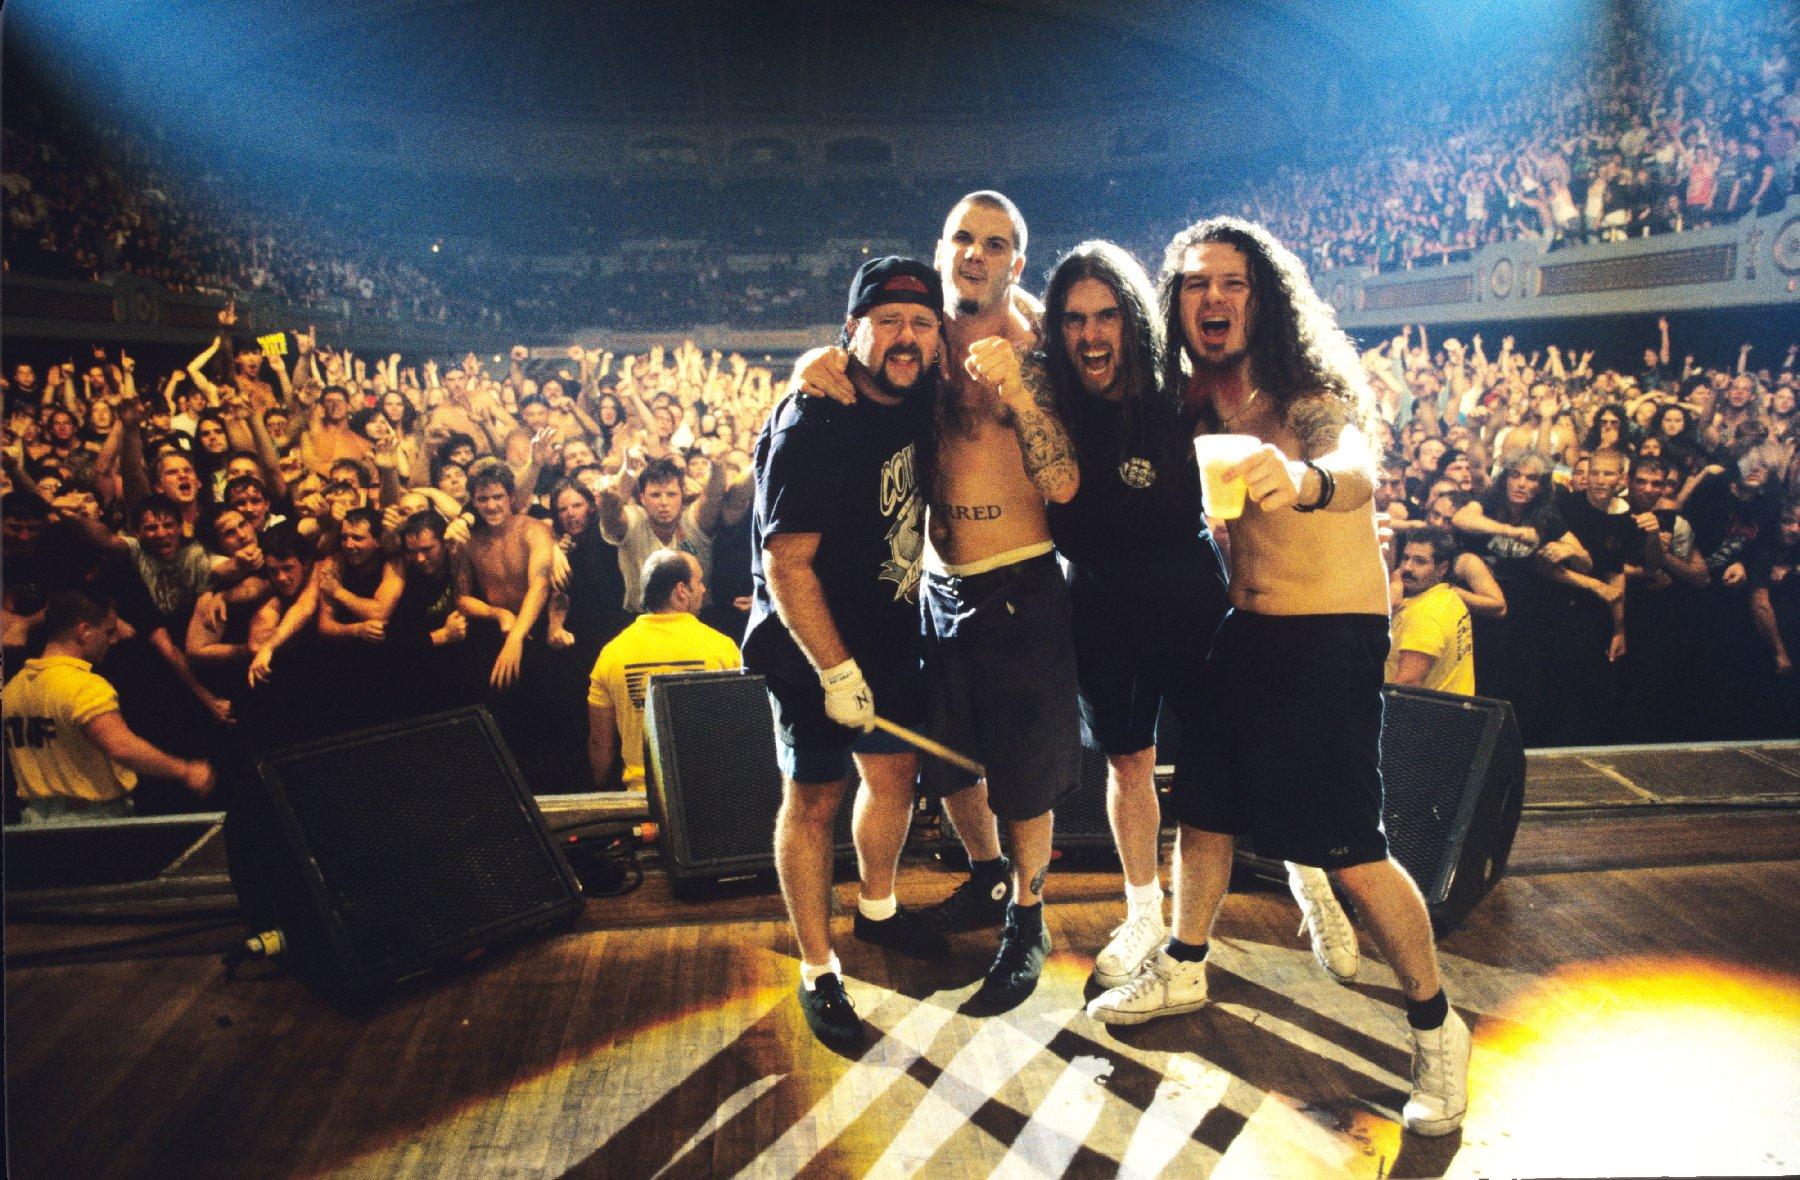 PANTERA thrash metal heavy concert crowd f wallpaper 1800x1180 1800x1180